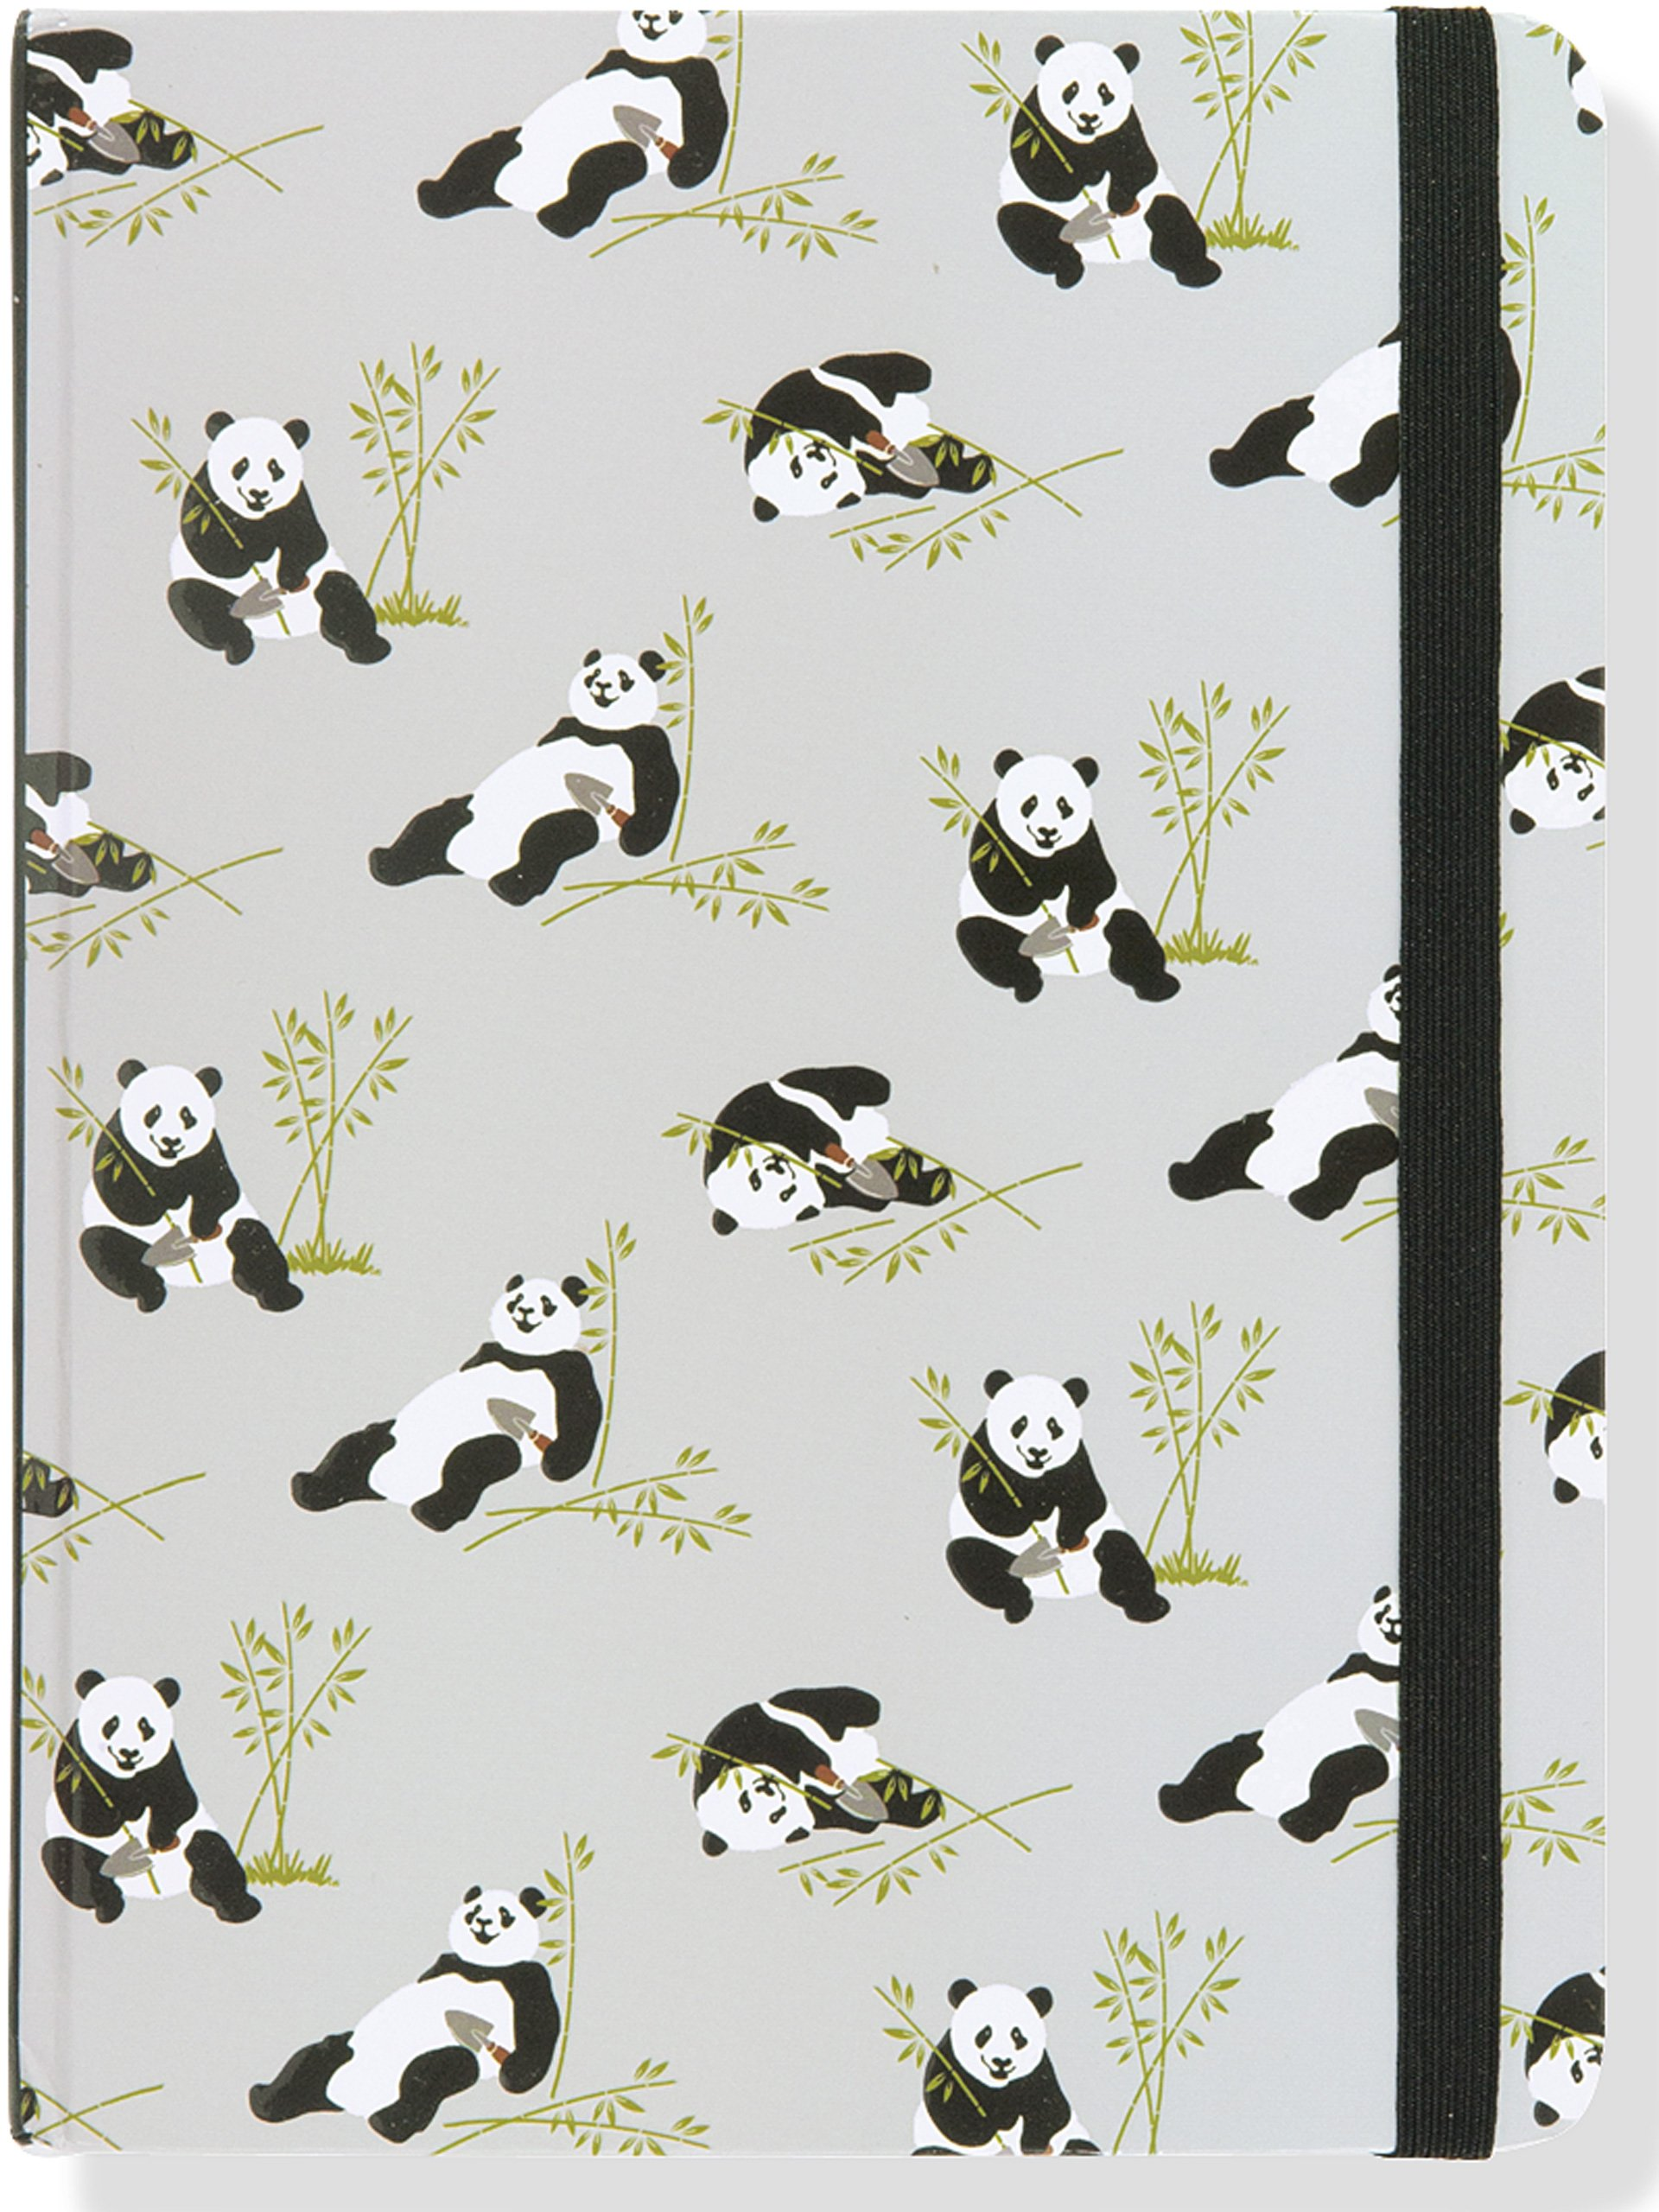 Pandas Journal Diary Notebook Pauper product image